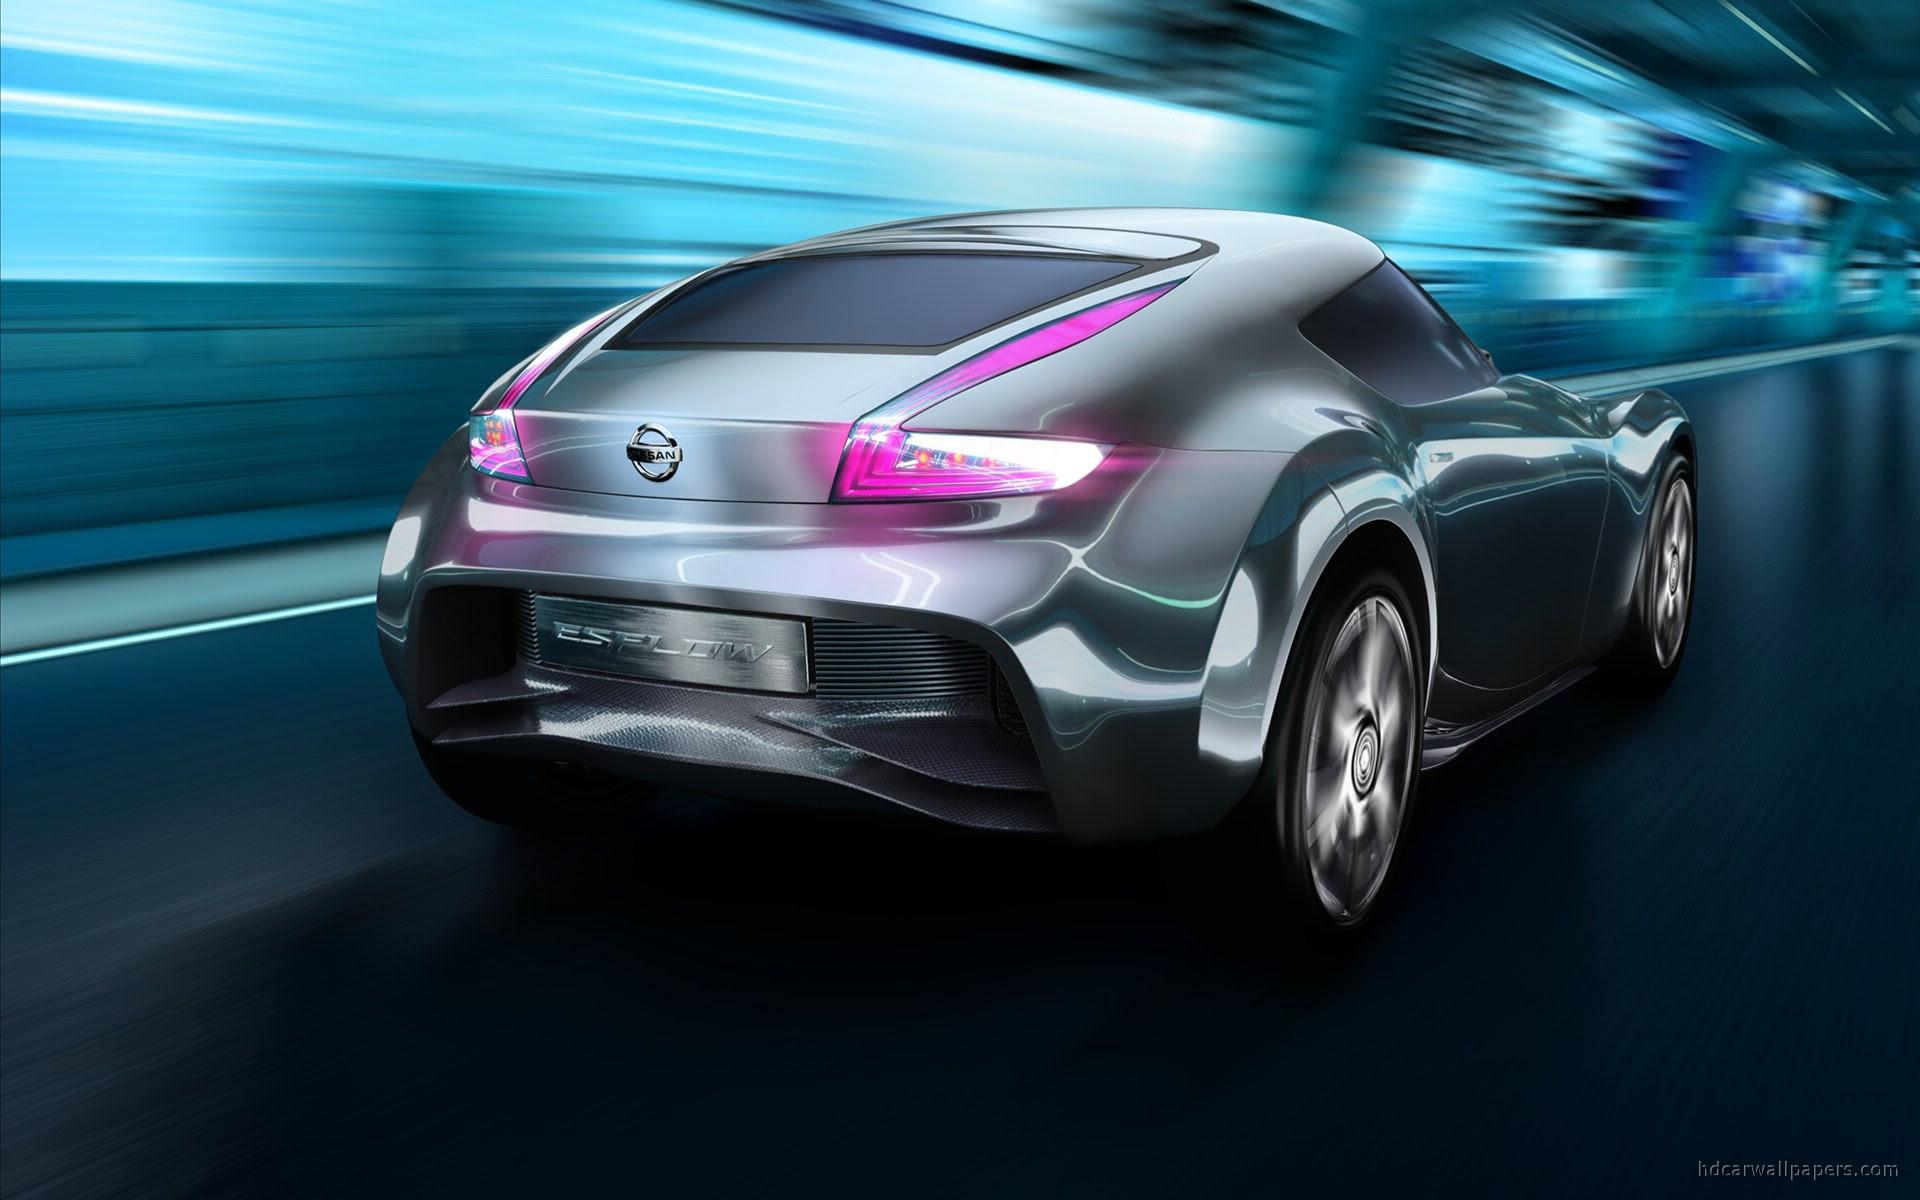 2011 Nissan Electric Sports Concept Car 2 Wallpaper | HD ...